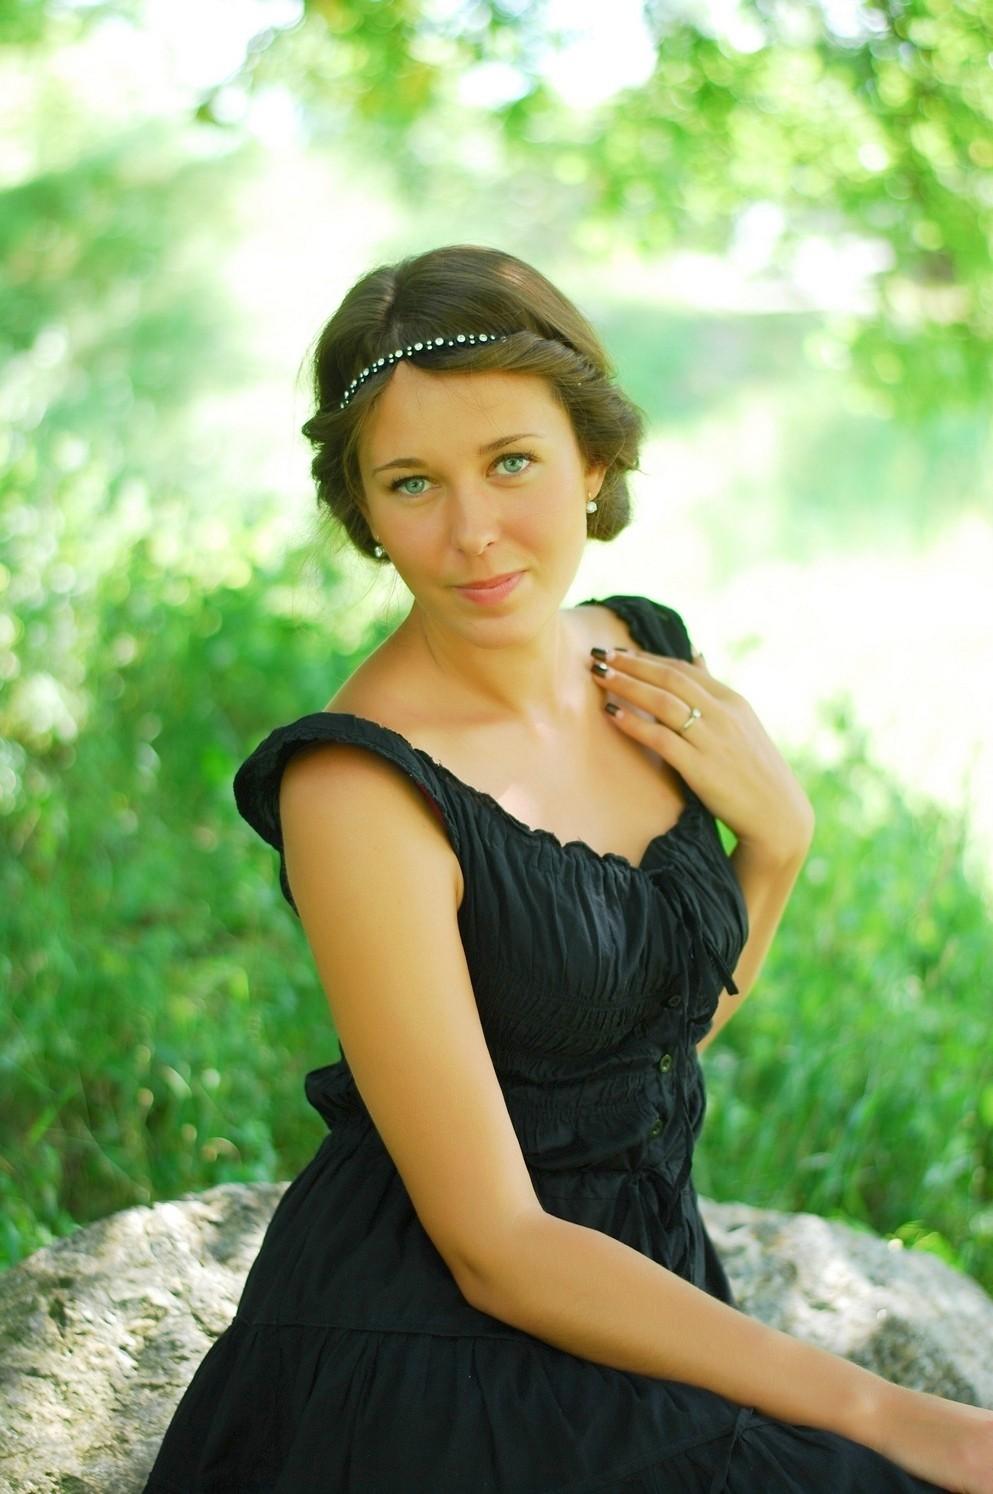 Ukrainian Single Girl (Bride): Victoria eyes, 25 years old